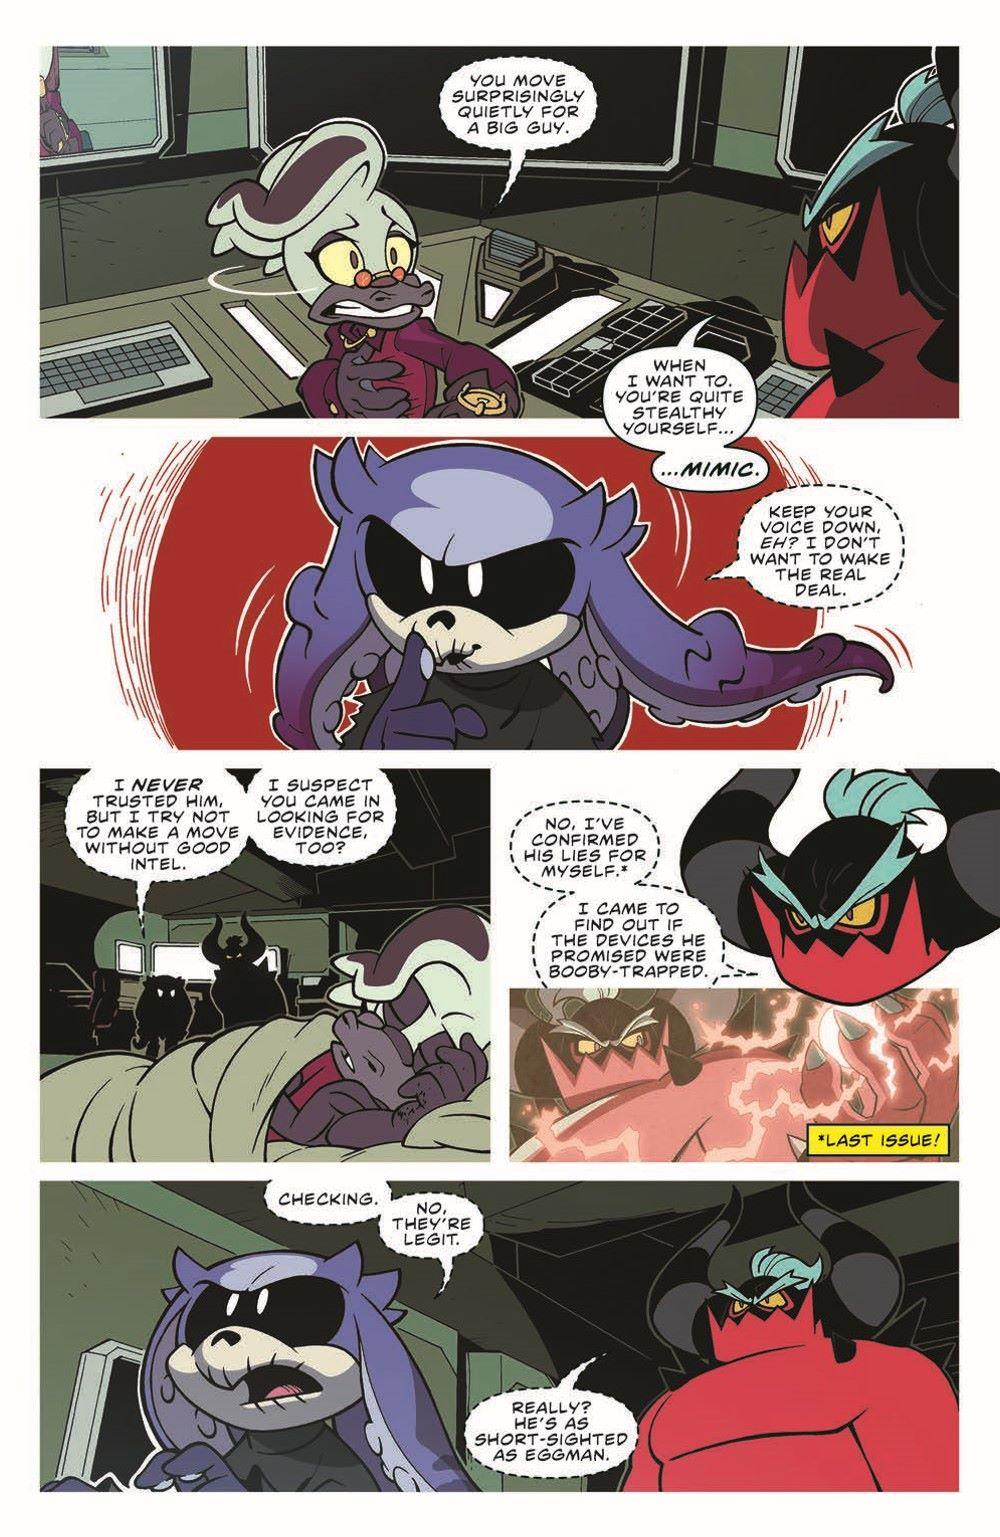 STH-BG03_pr-6 ComicList Previews: SONIC THE HEDGEHOG BAD GUYS #3 (OF 4)